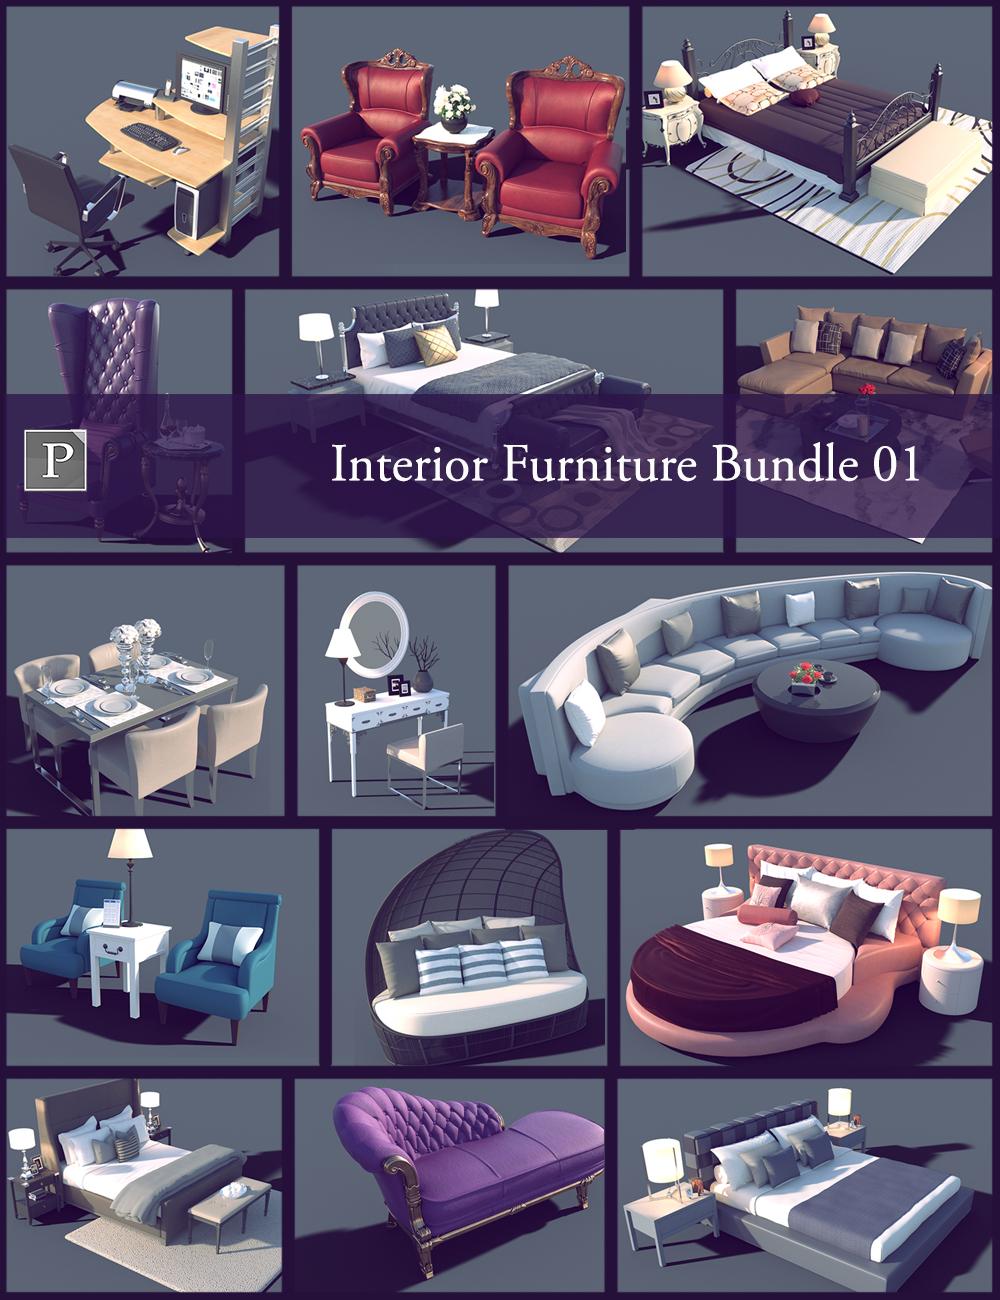 Interior Furniture Bundle 01 by: Polish, 3D Models by Daz 3D